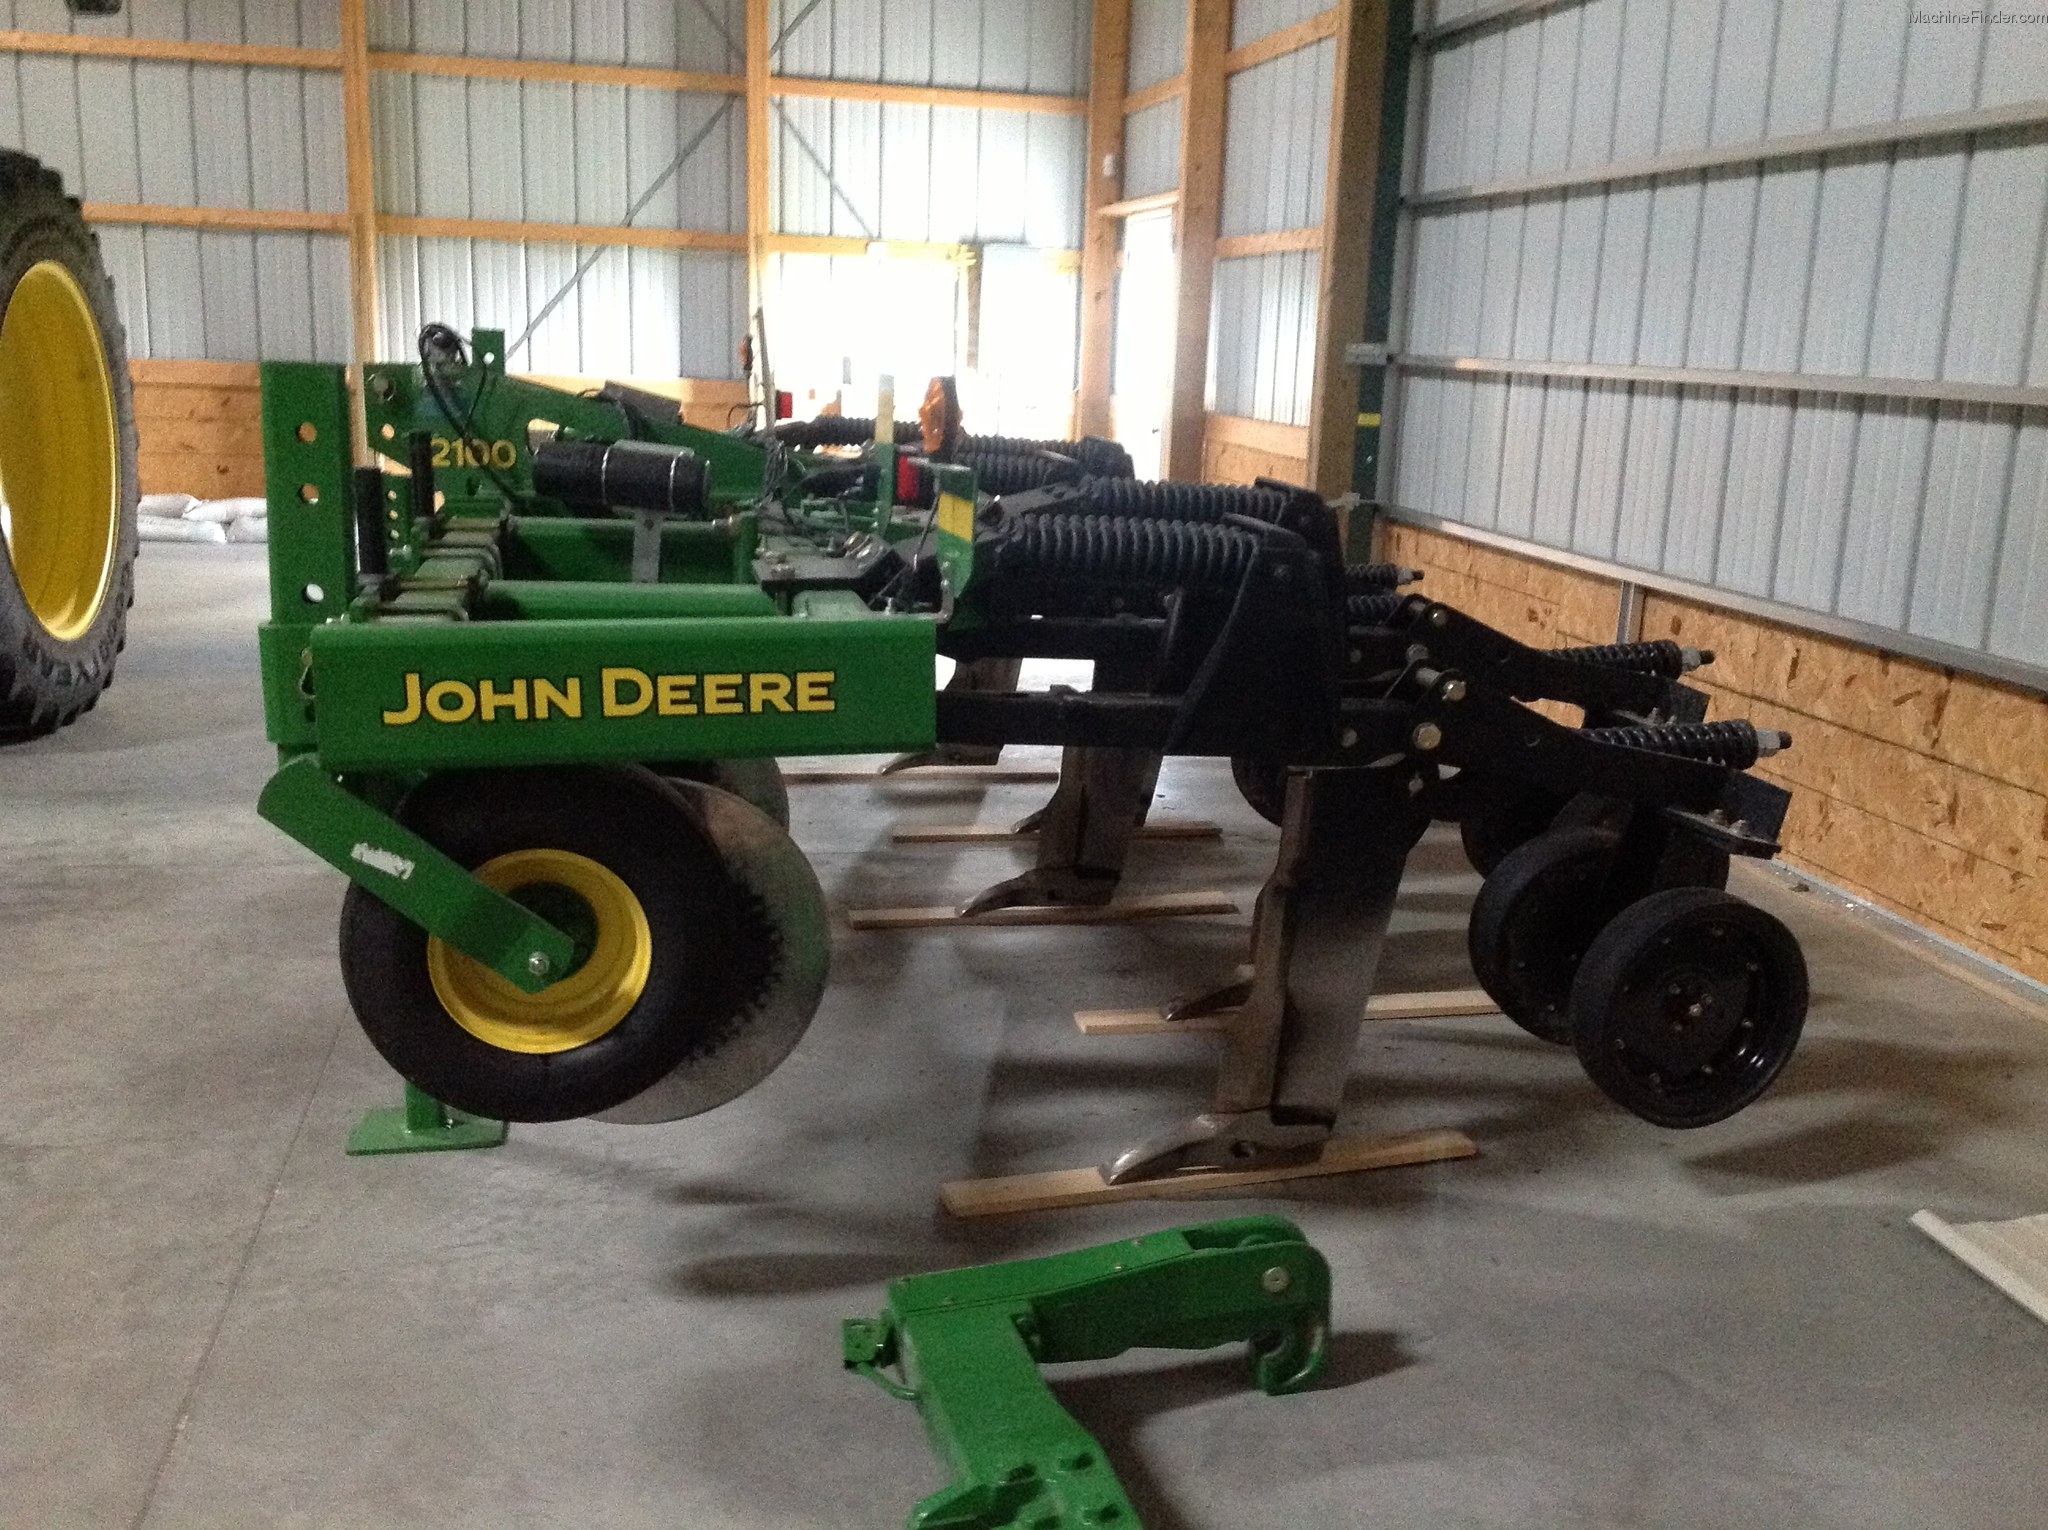 2012 John Deere 2100 Tillage - John Deere MachineFinder